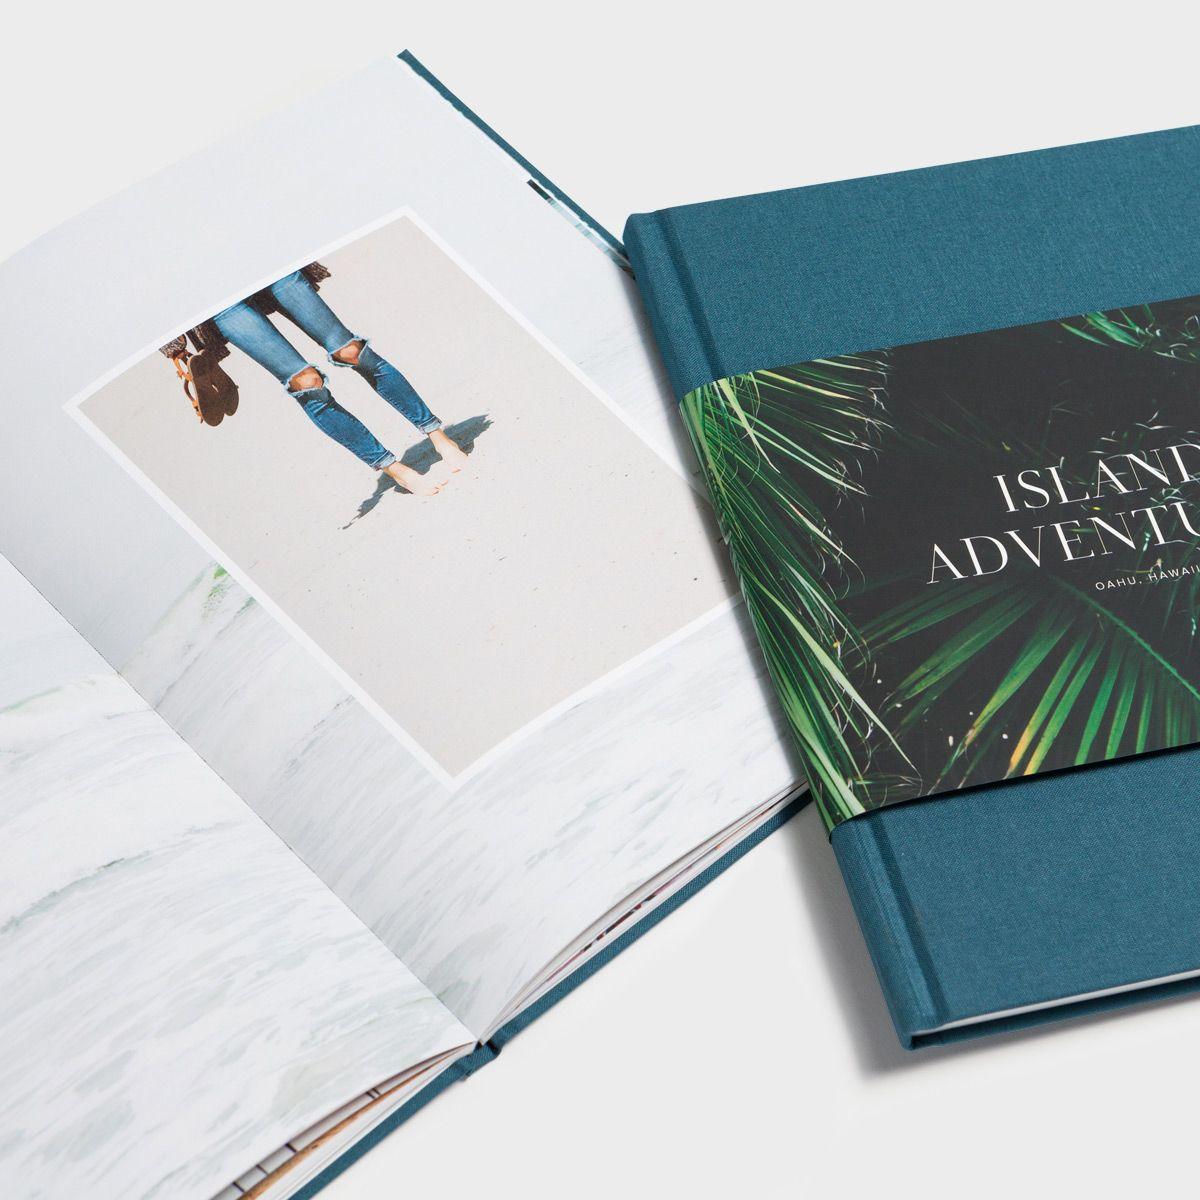 hardcover-main02-island-adventures_2x_1.jpg